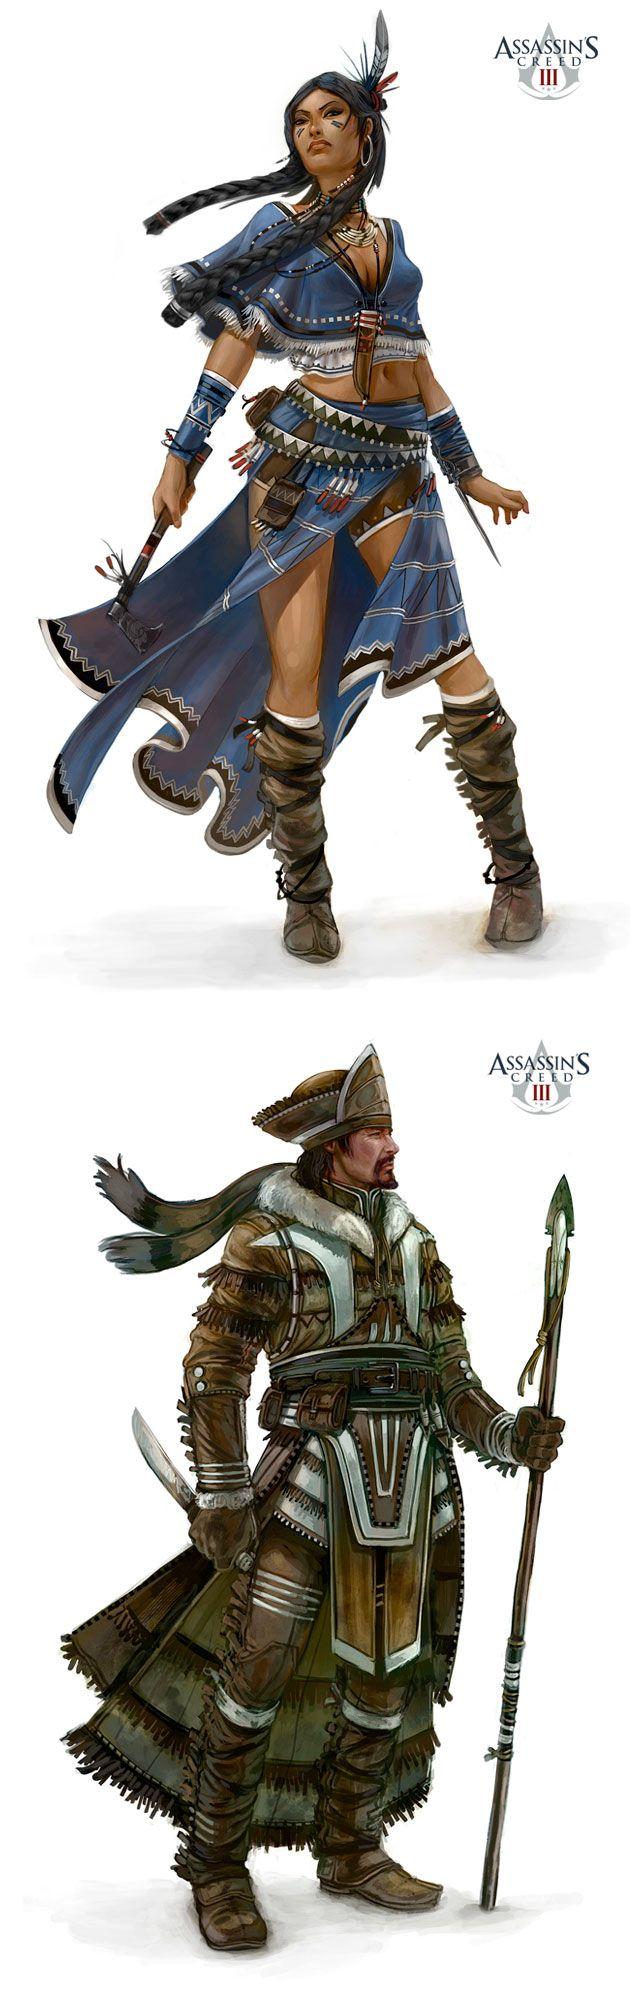 http://theconceptartblog.com/wp-content/uploads/2013/03/Assassins-ConceptArts-Antoine-3.jpg